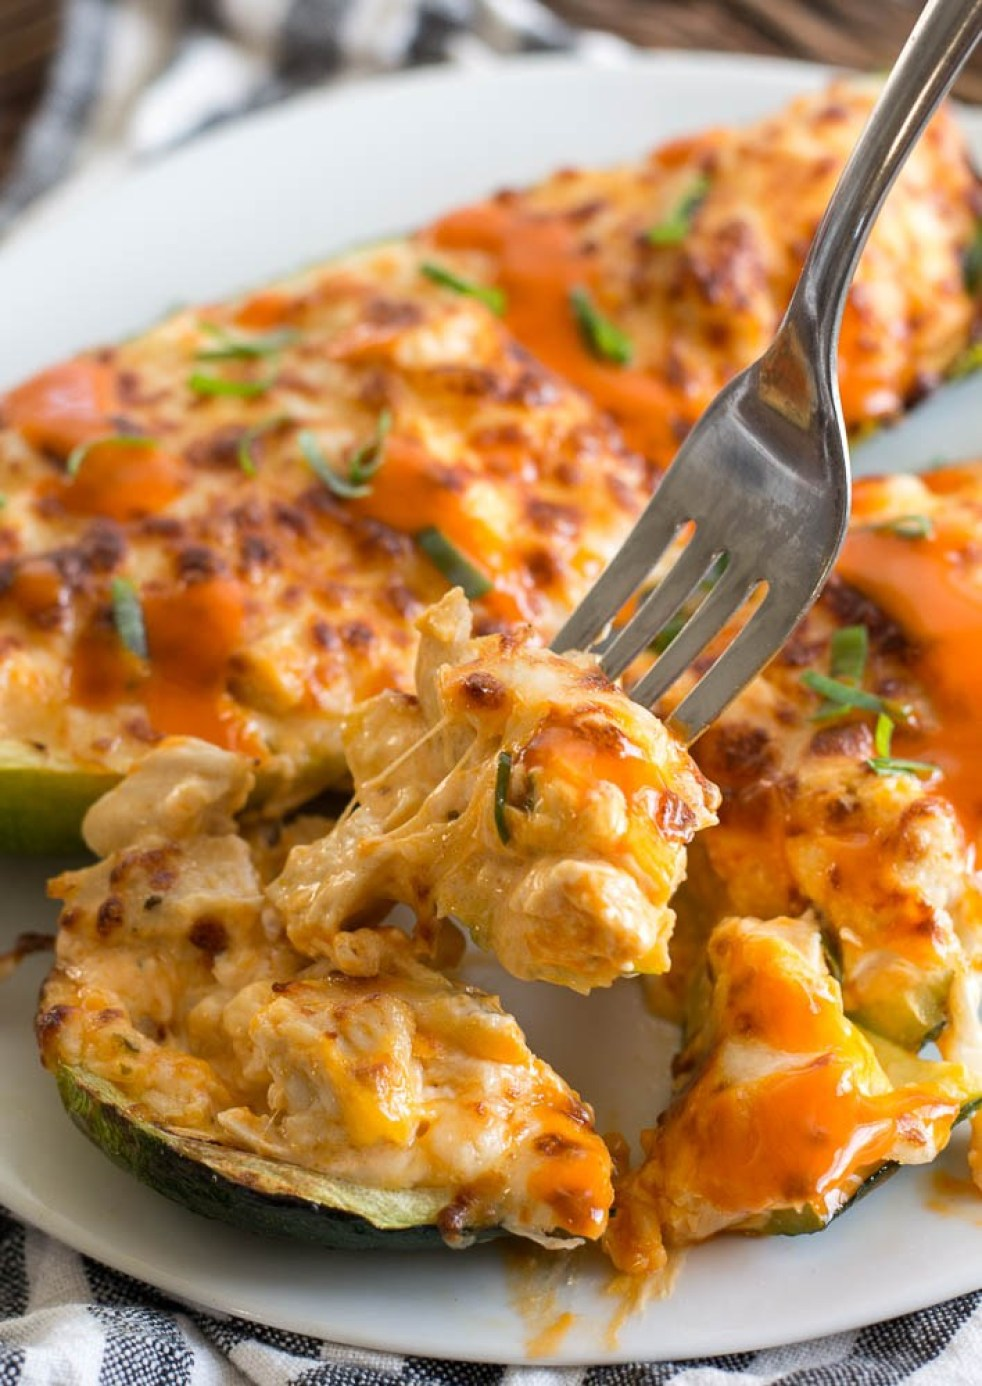 MyFinancialHill Air Fryer Keto Buffalo Chicken Zucchini Boats Healthy Low Carb Dinner